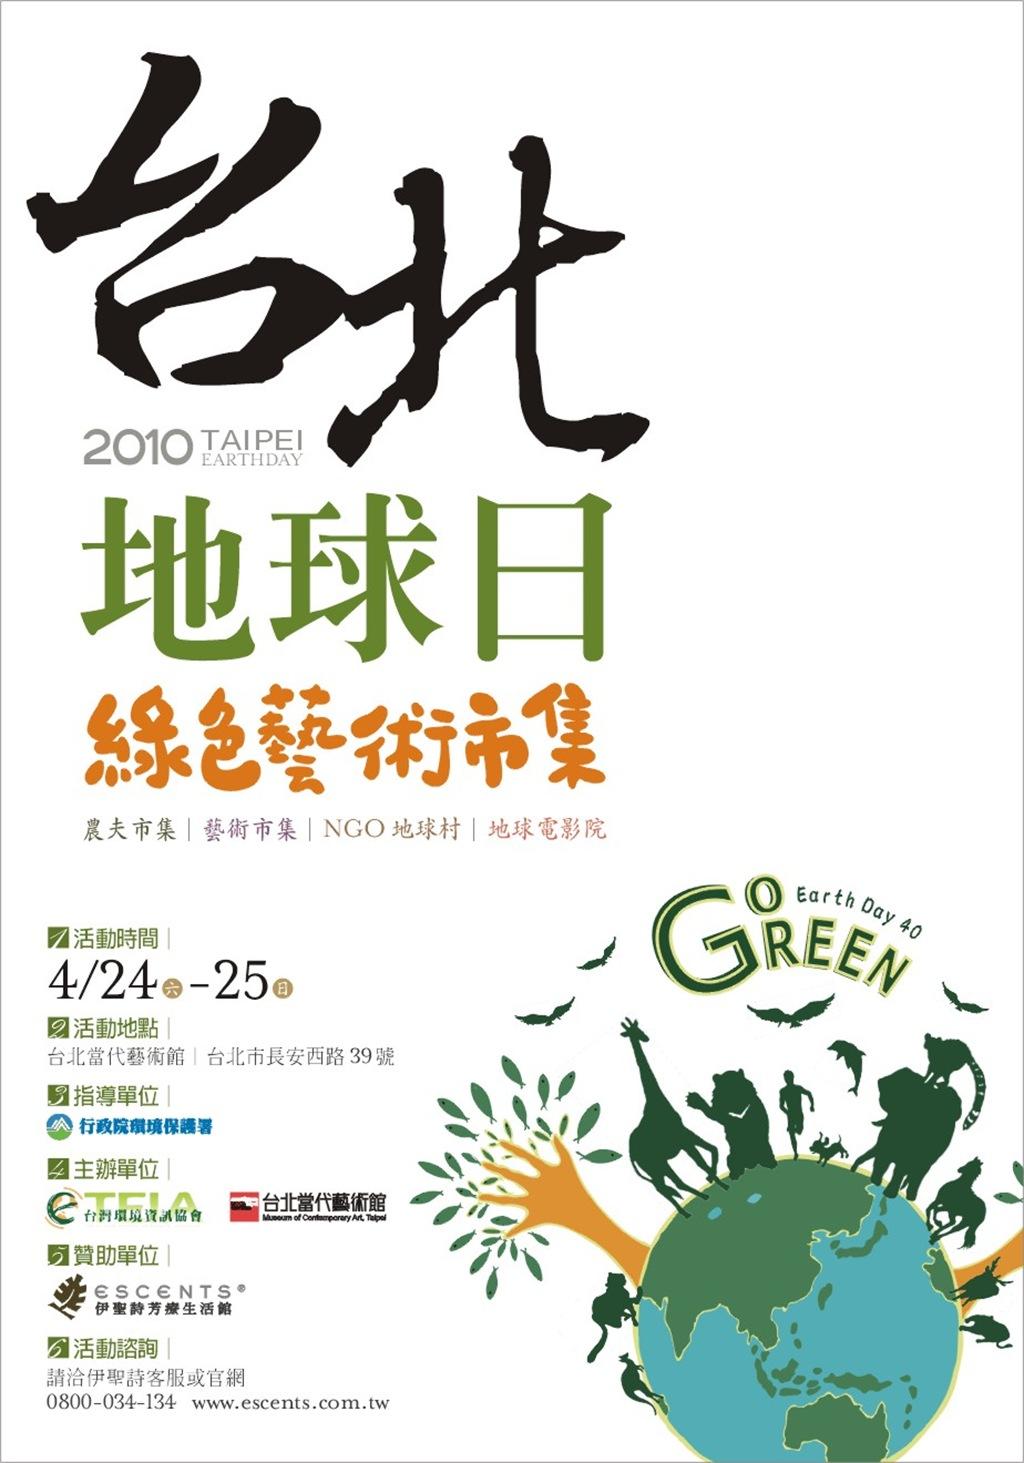 t2010-台北地球日明信片(正)t